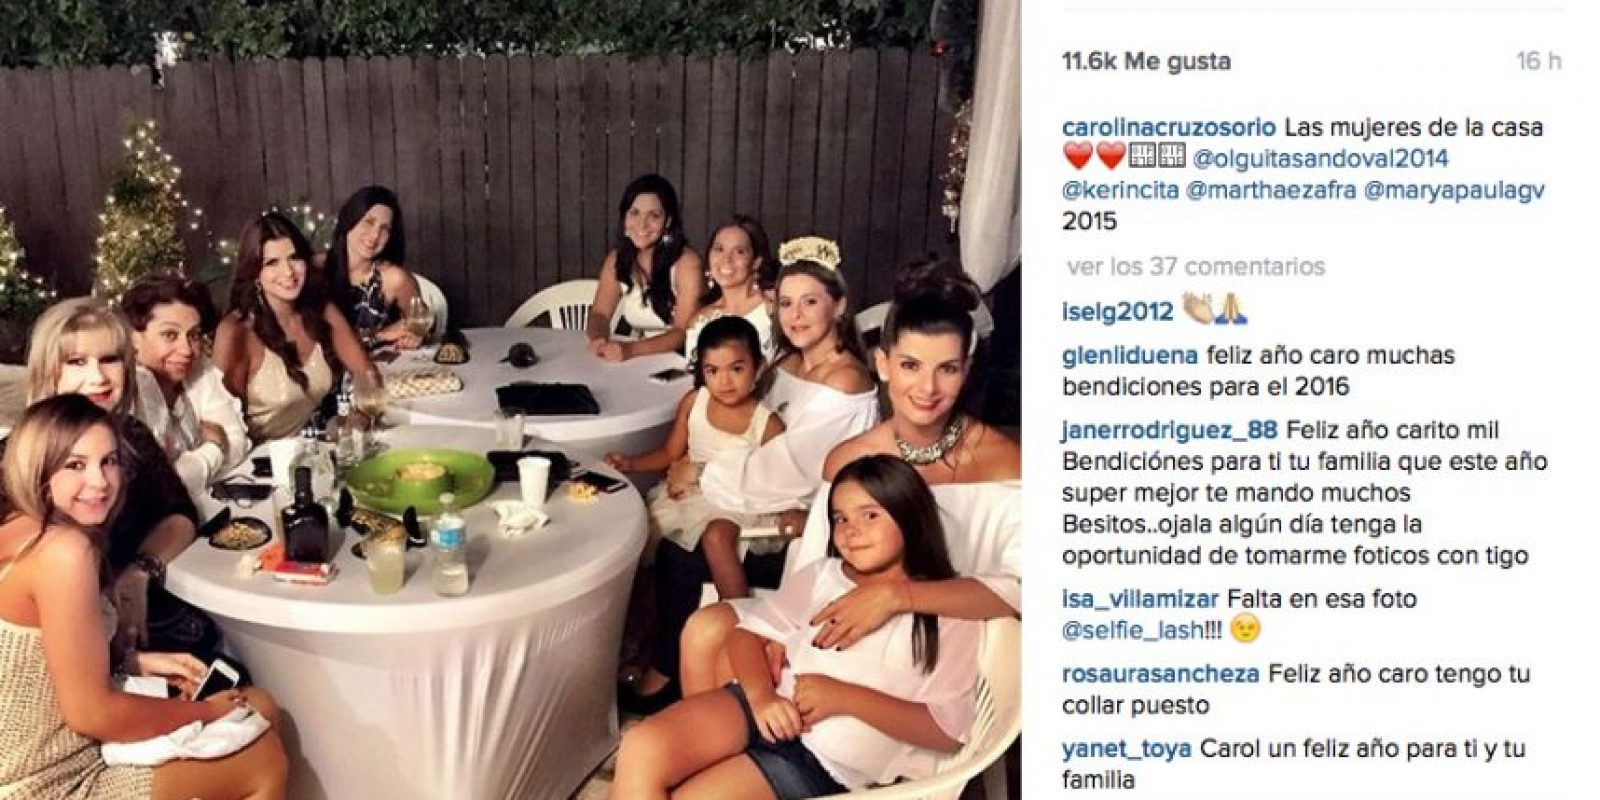 Foto:Instagram @Carolinacruzosorio